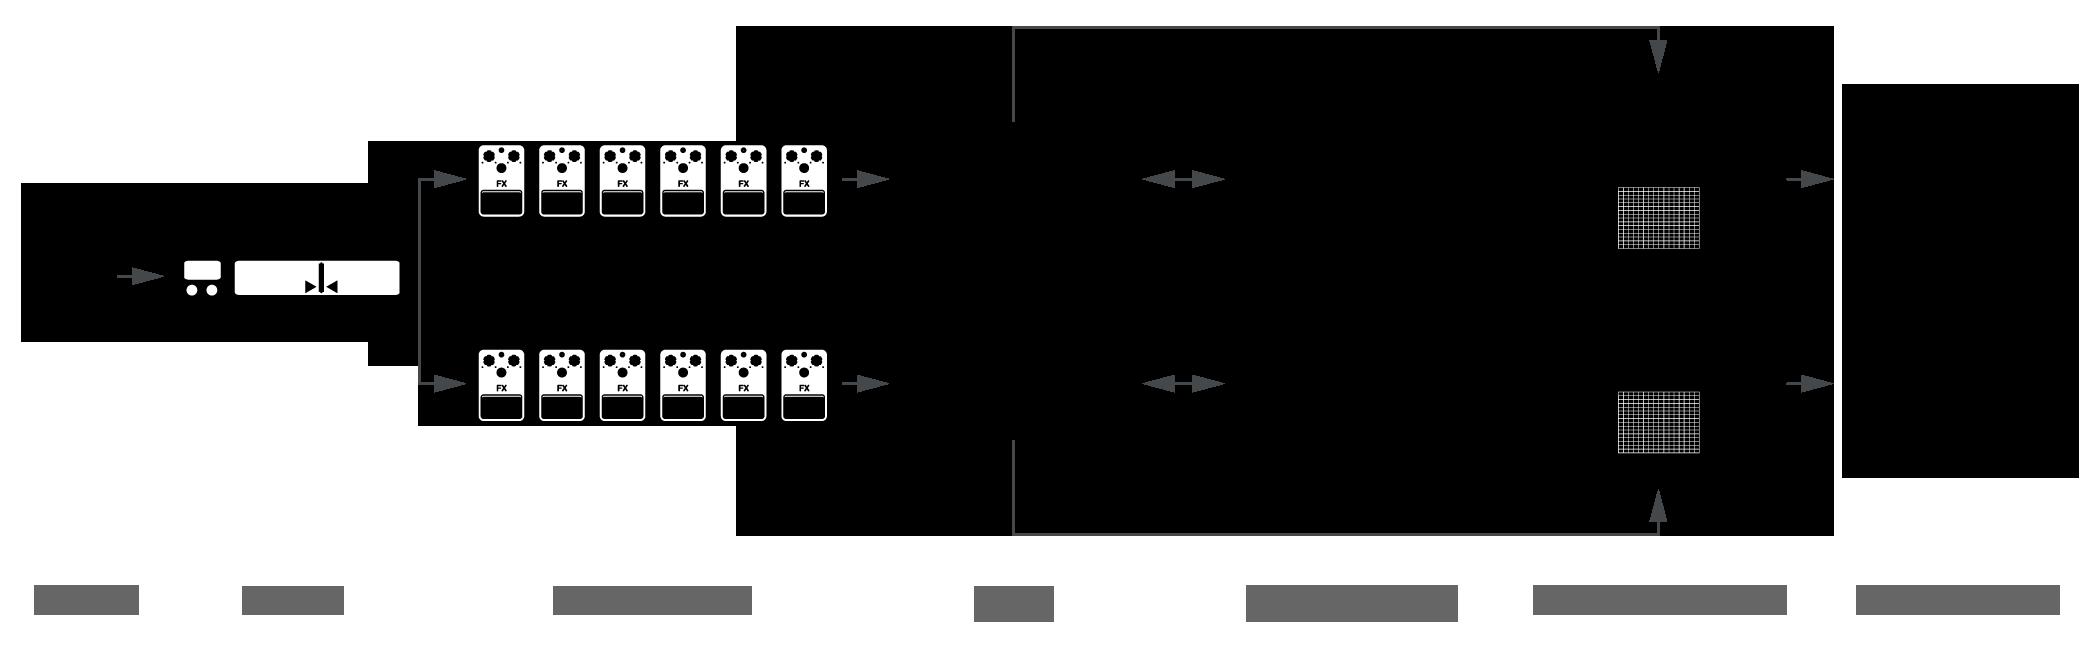 Amplitube Signal Chain Guitar Plugins